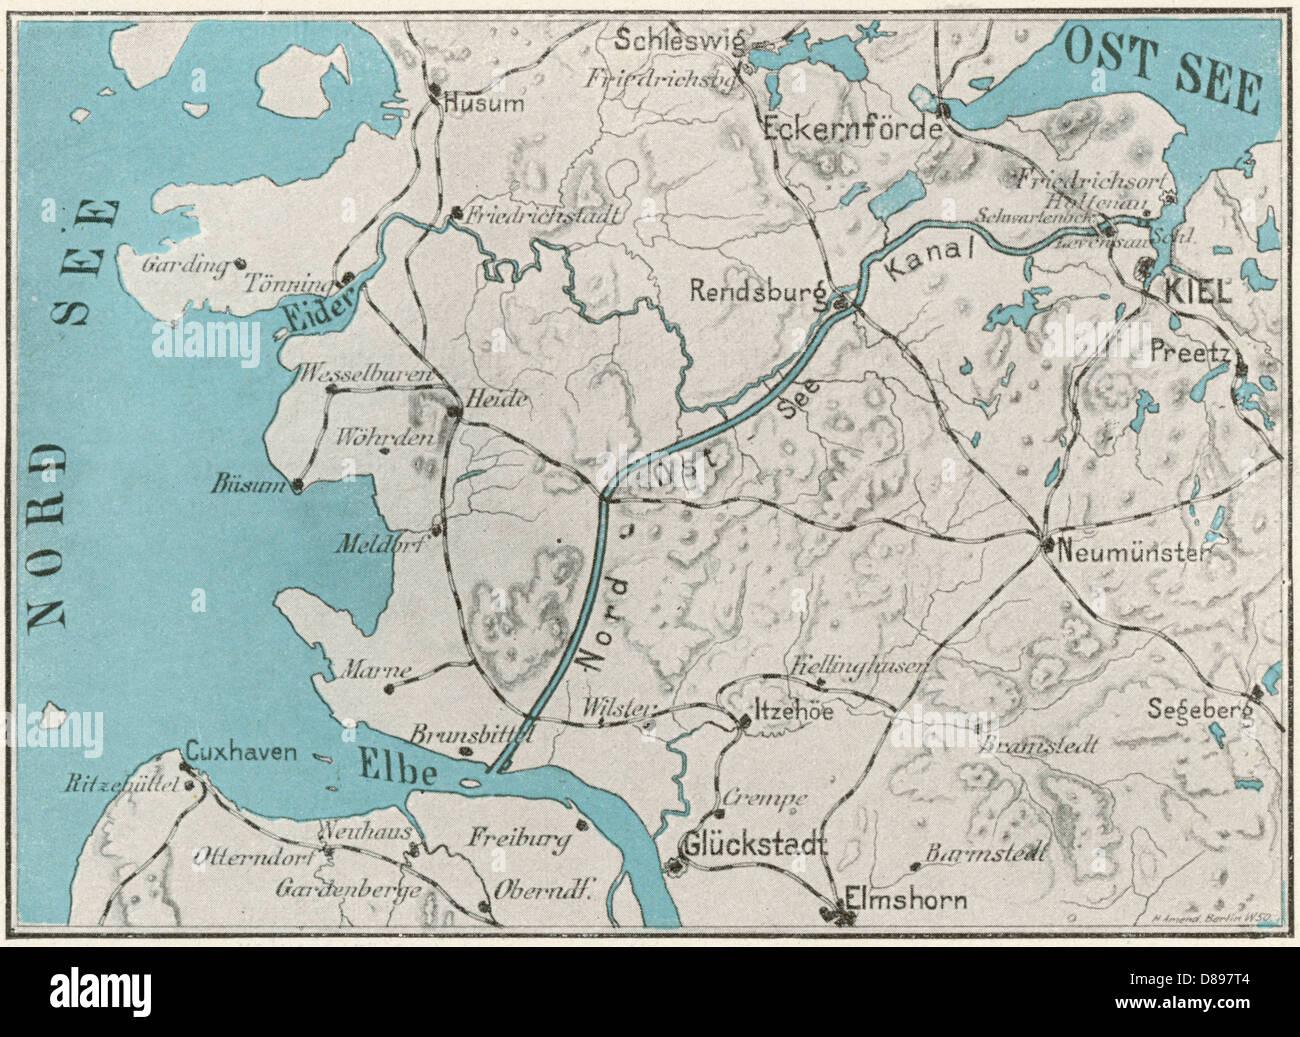 Kiel Canal Map Stock Photo Royalty Free Image 56752084 Alamy